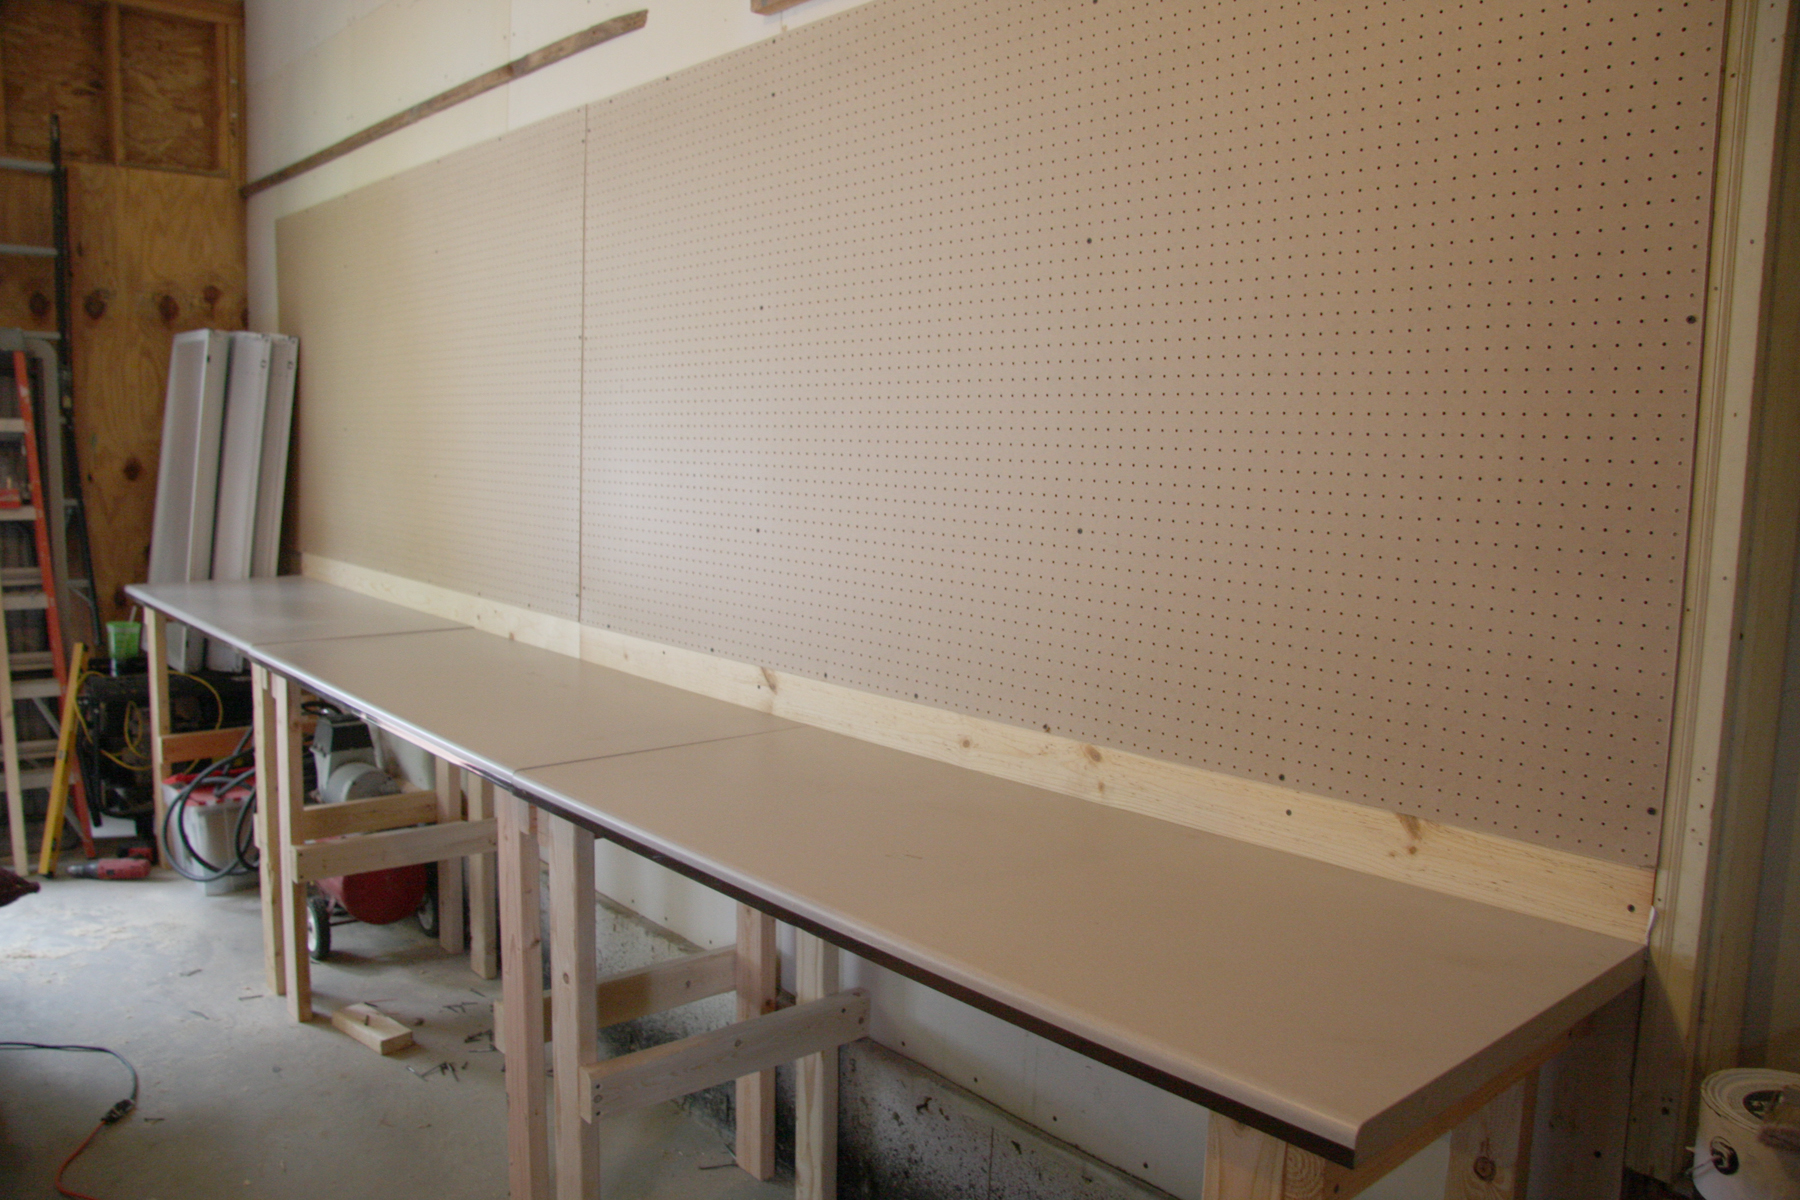 DIY workbench how-to {Love My DIY Home}